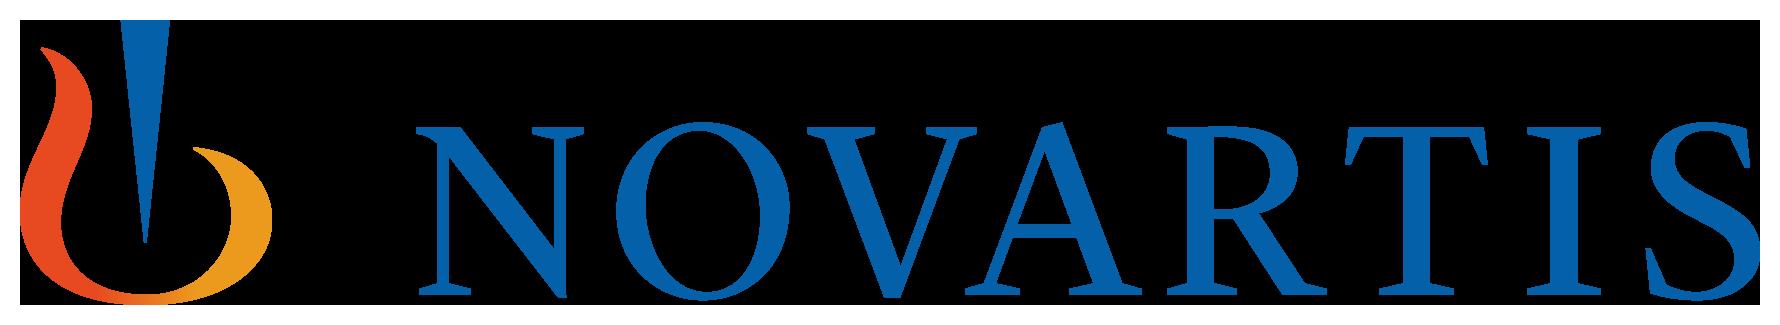 novartis_logo_pos_rgb.png